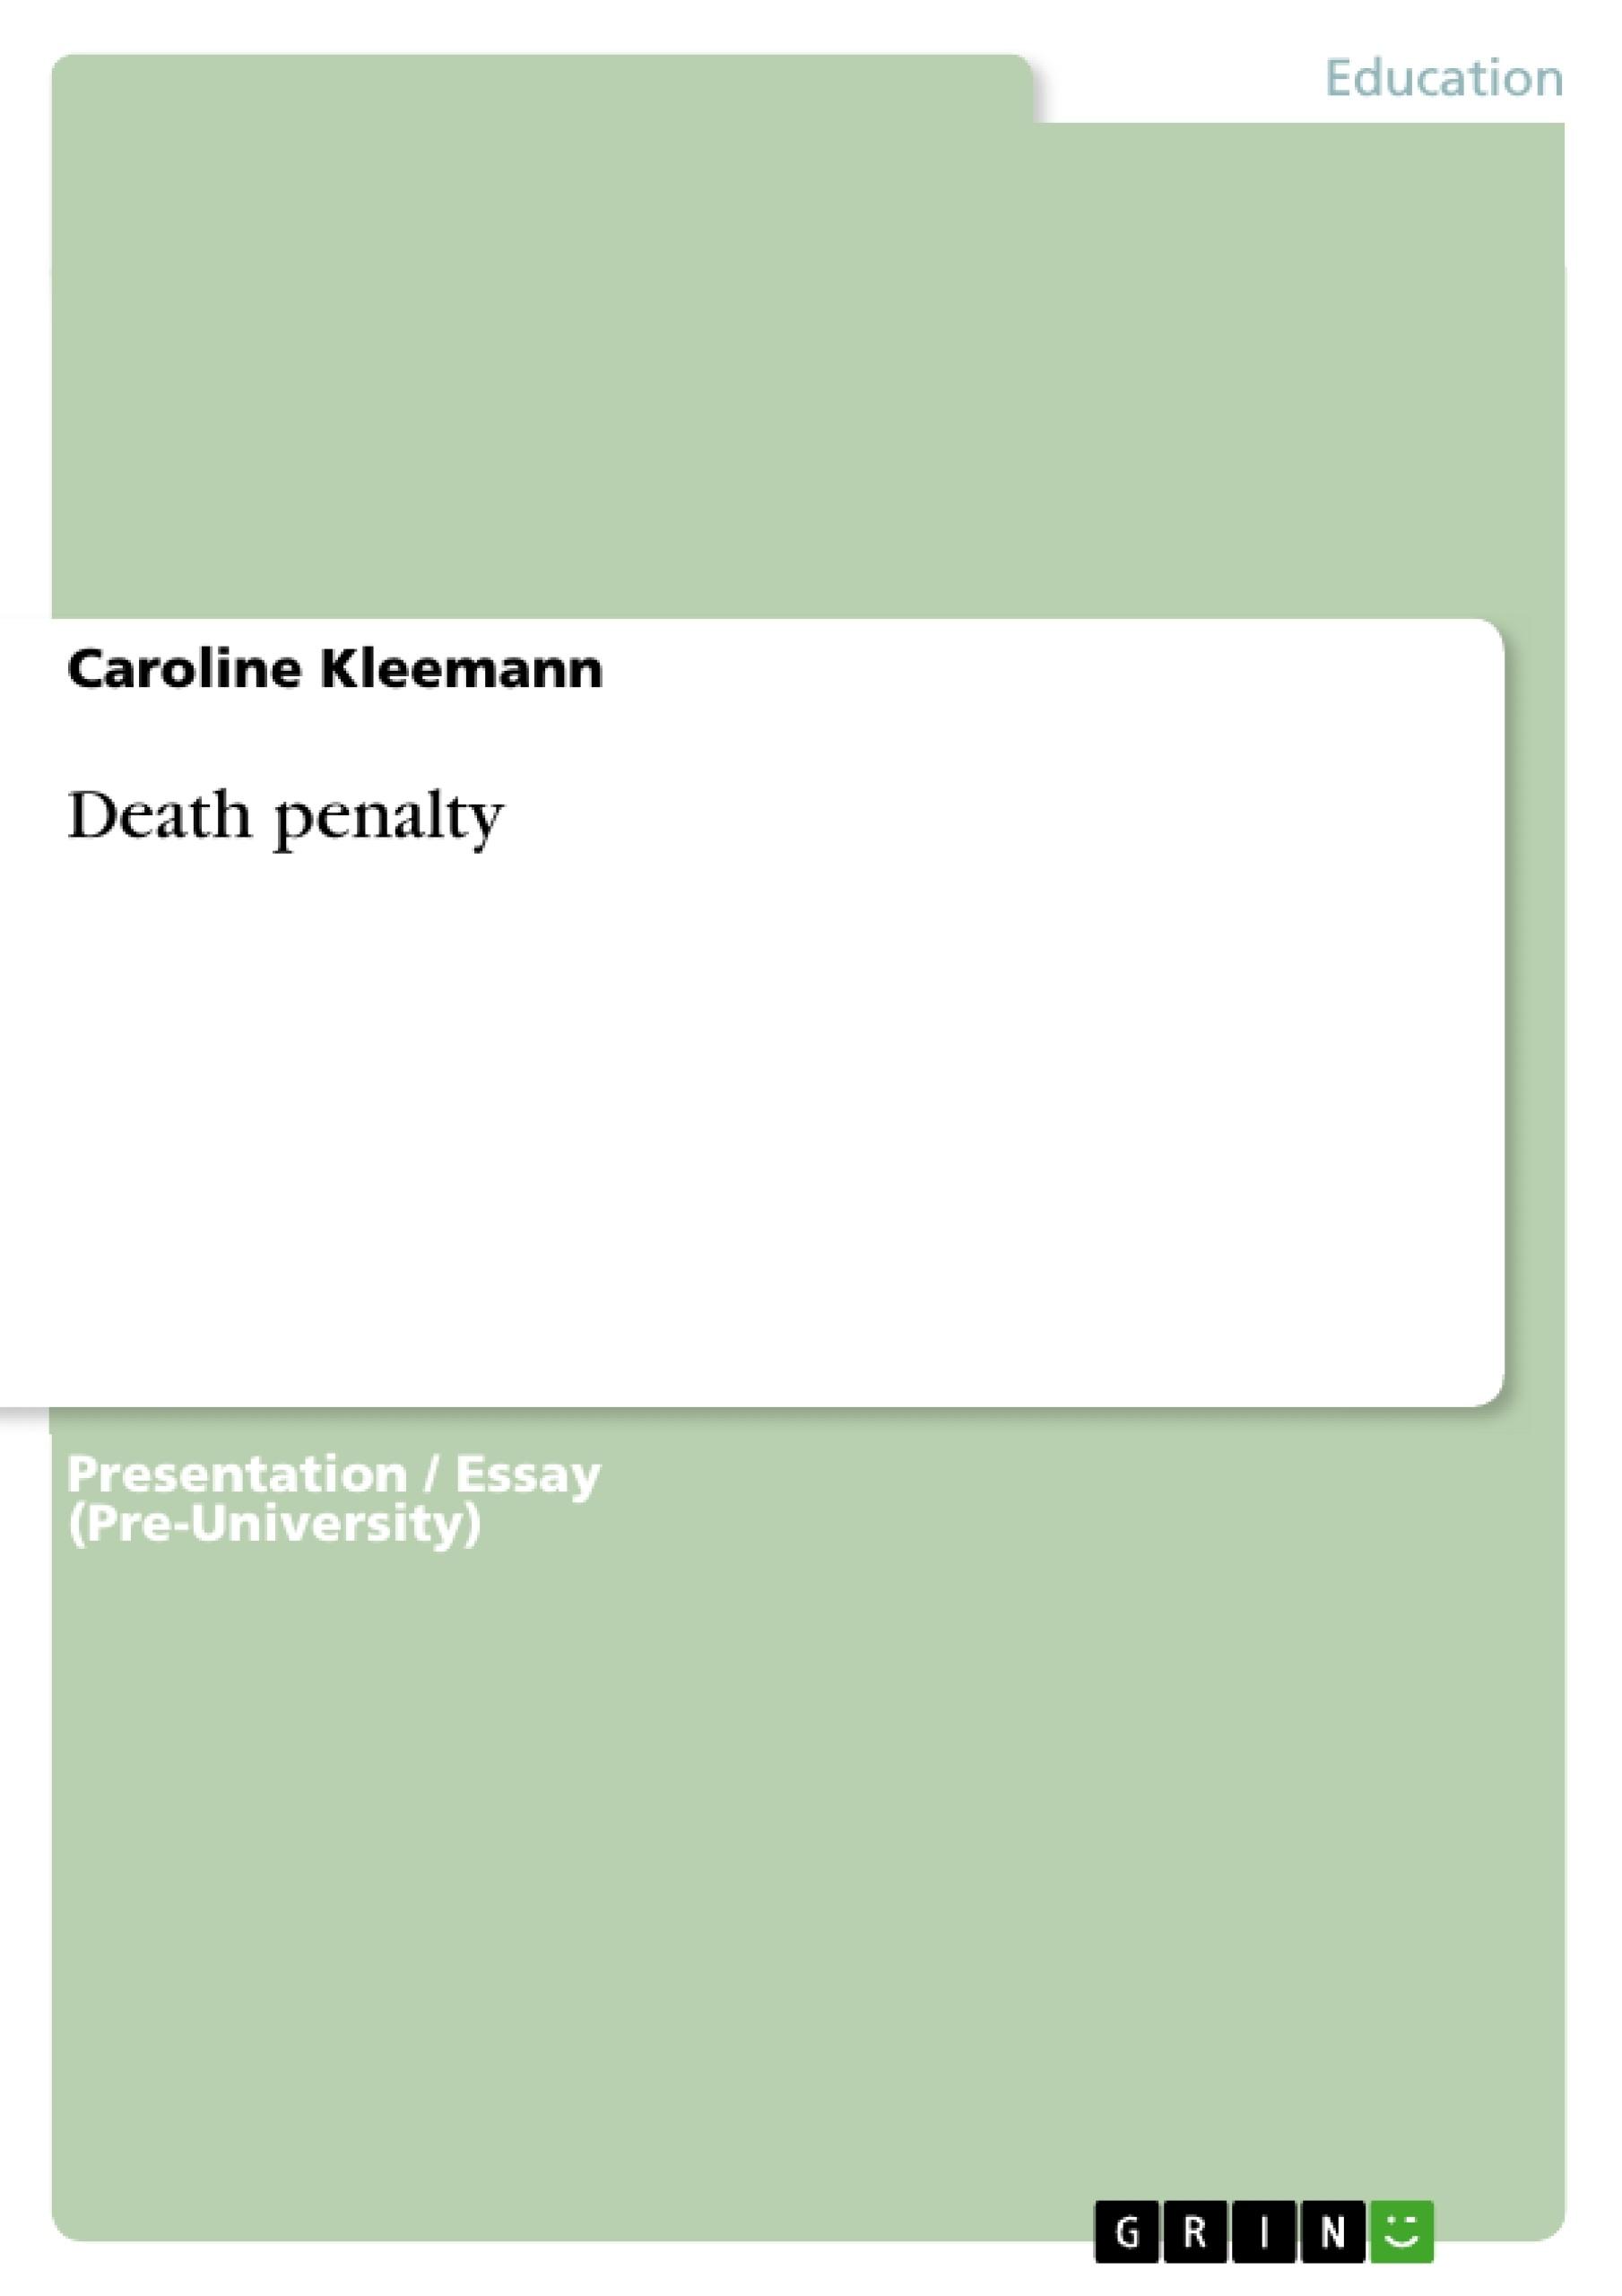 Title: Death penalty